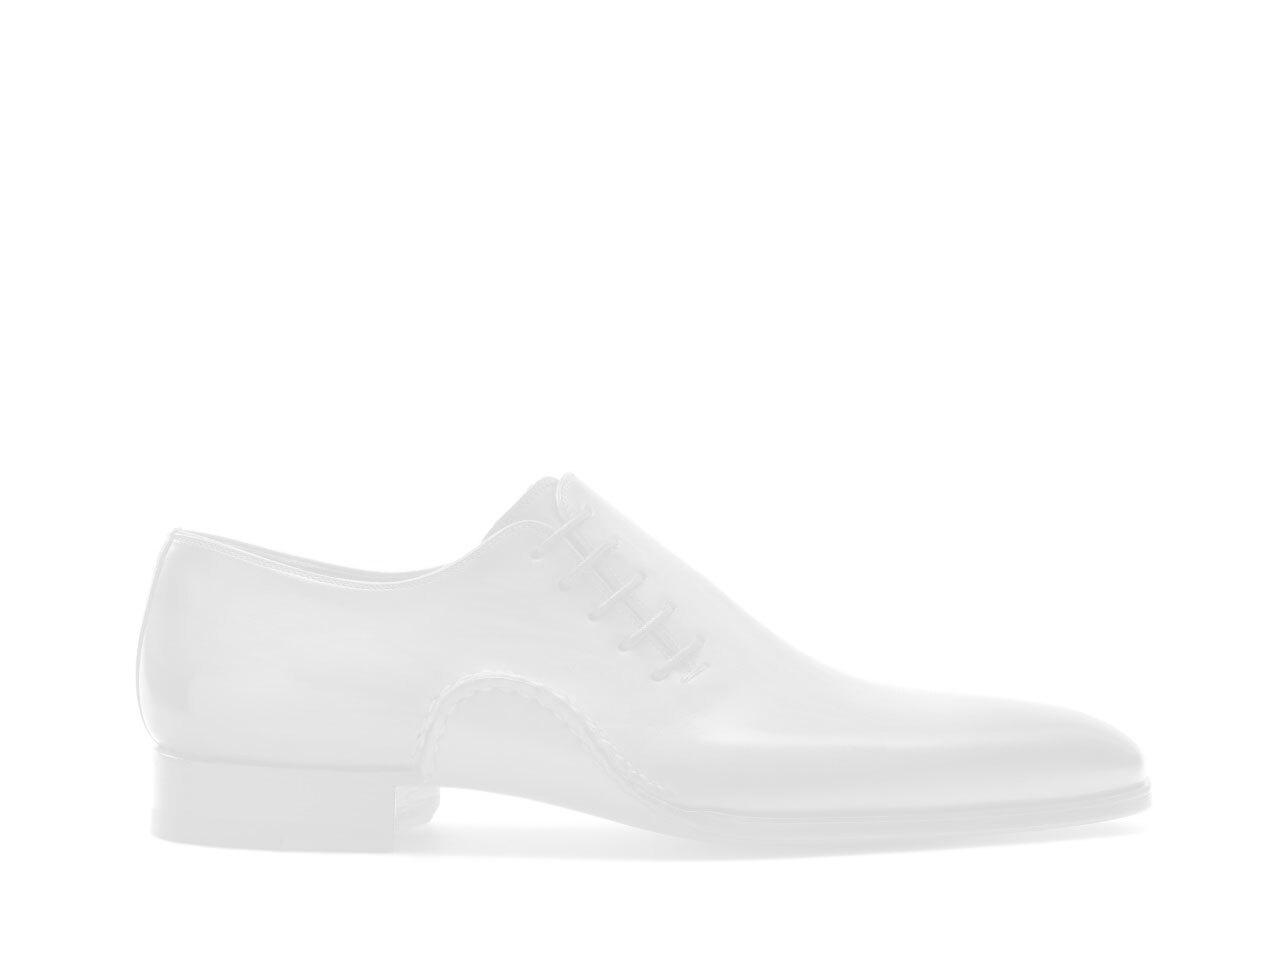 Sole of the Magnanni Marco II Grafito Men's Single Monk Strap Shoes